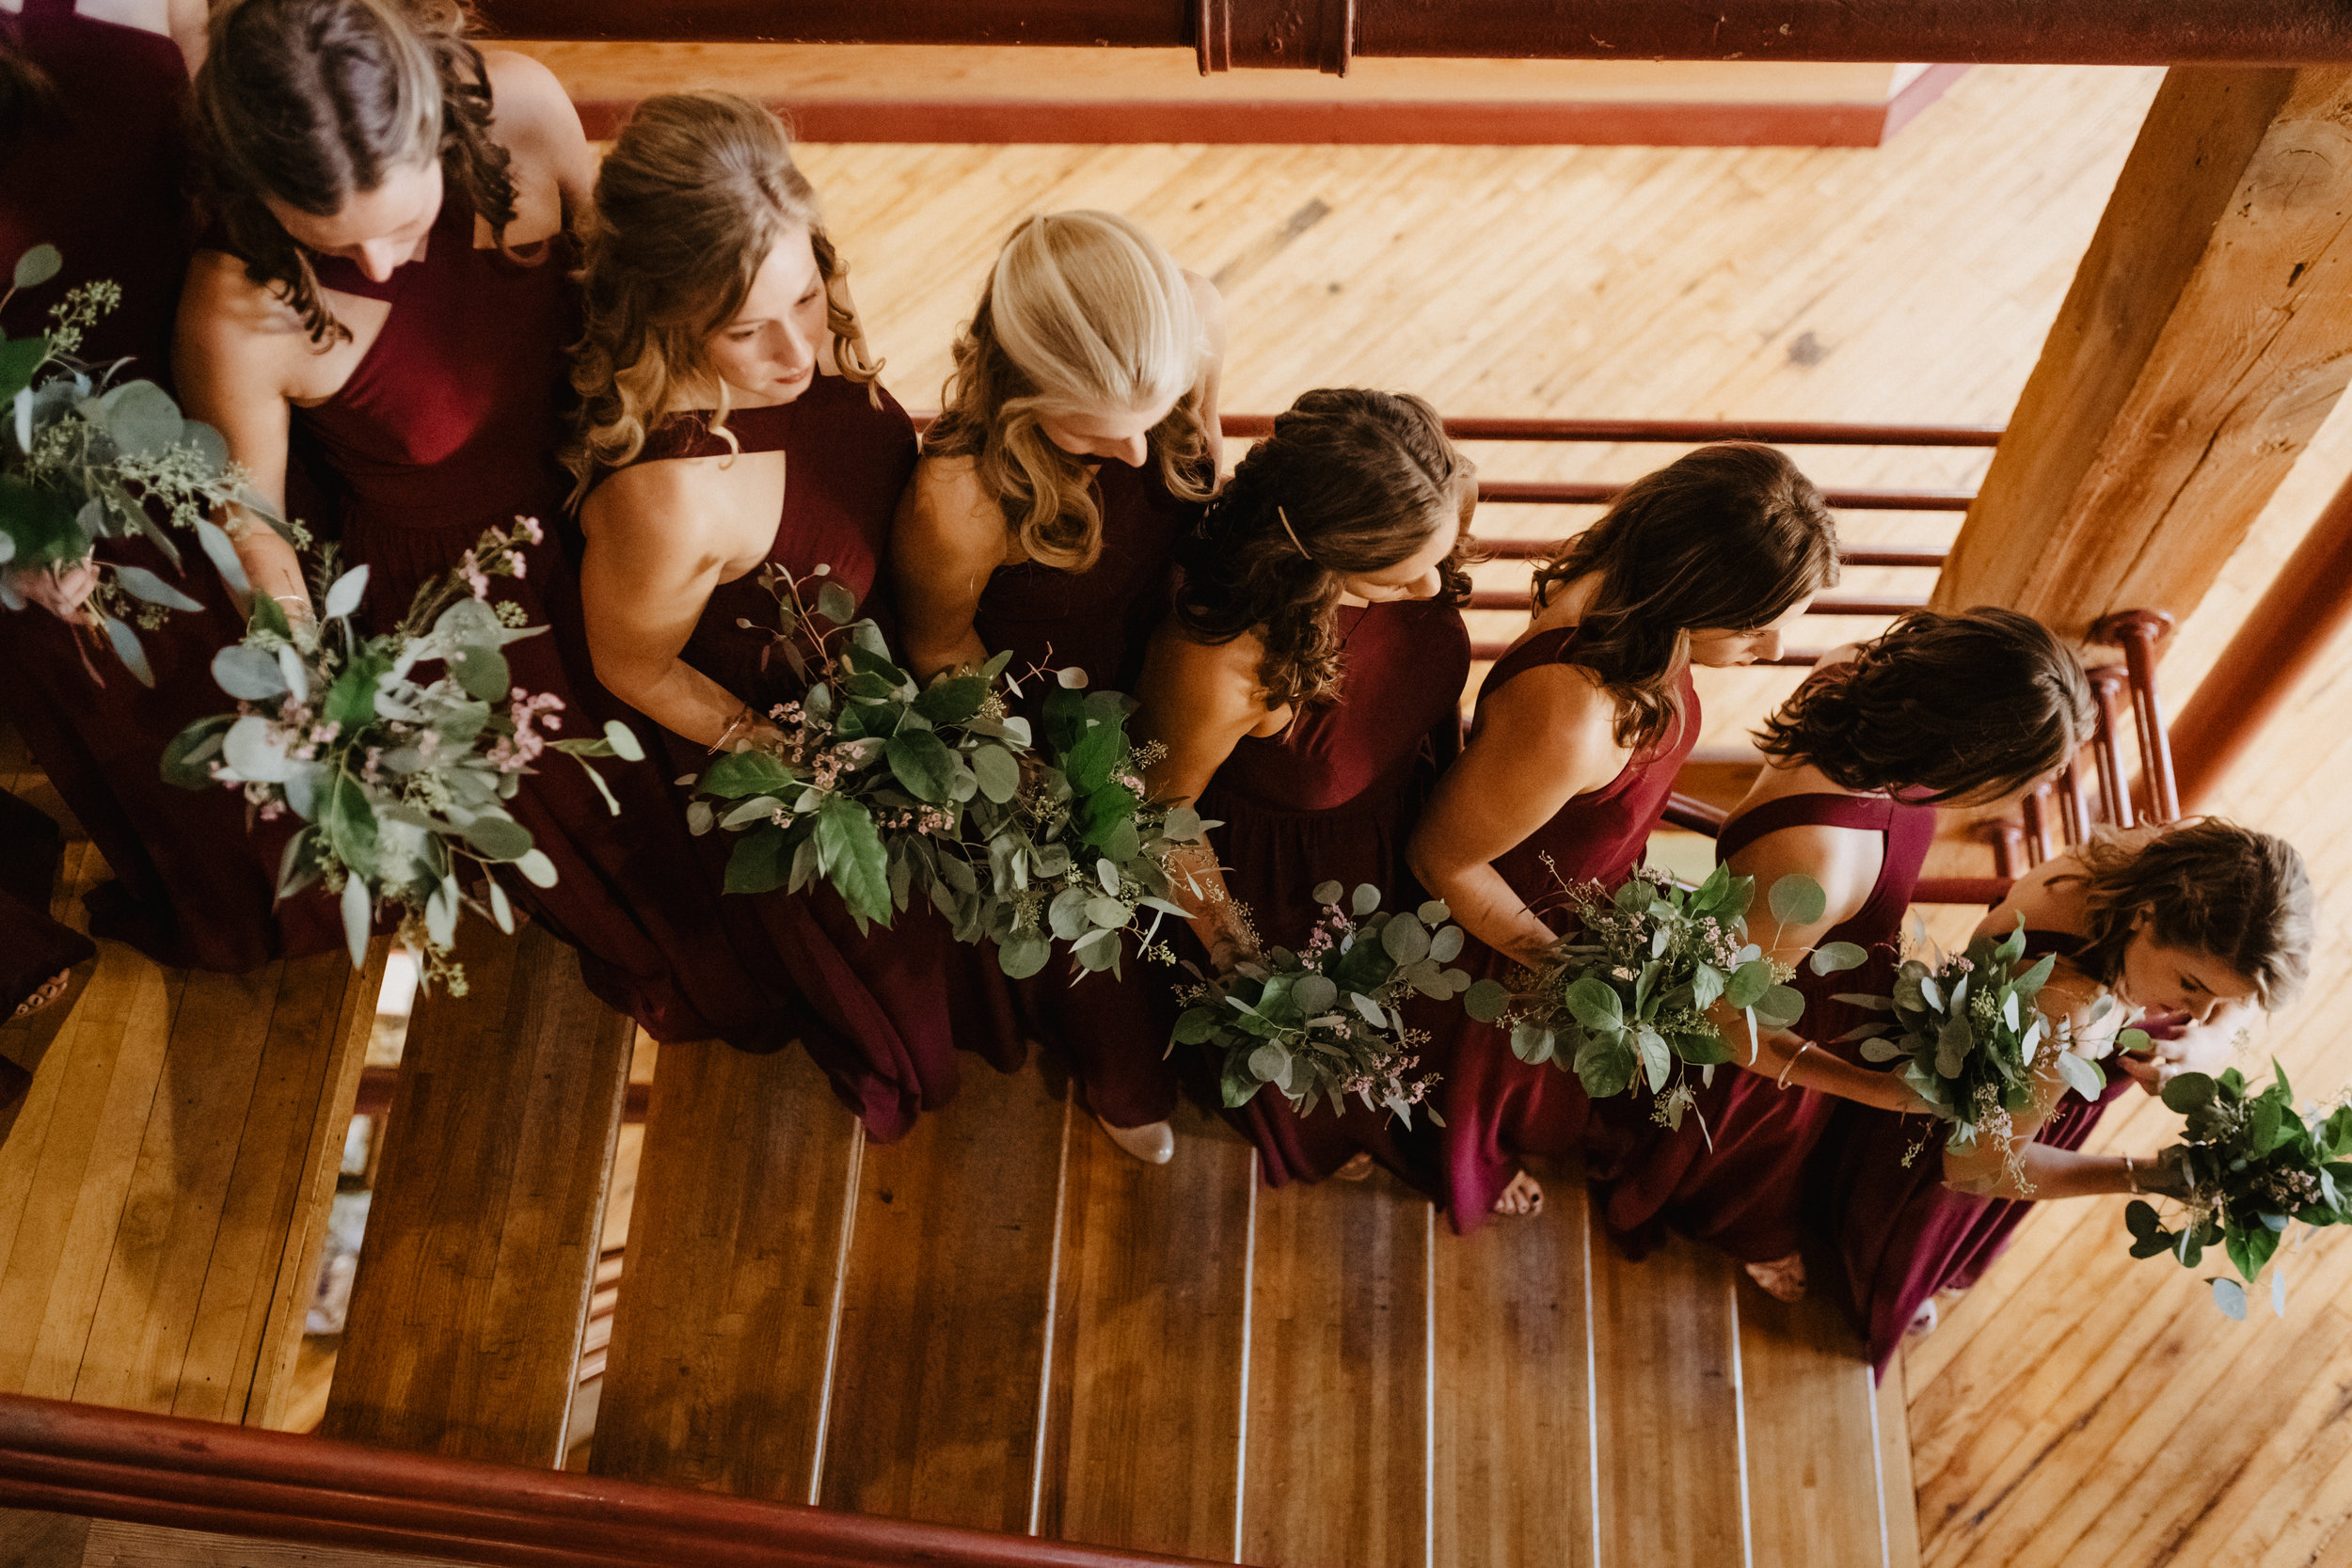 Interior-Building-Wood-Wedding-Photos-01